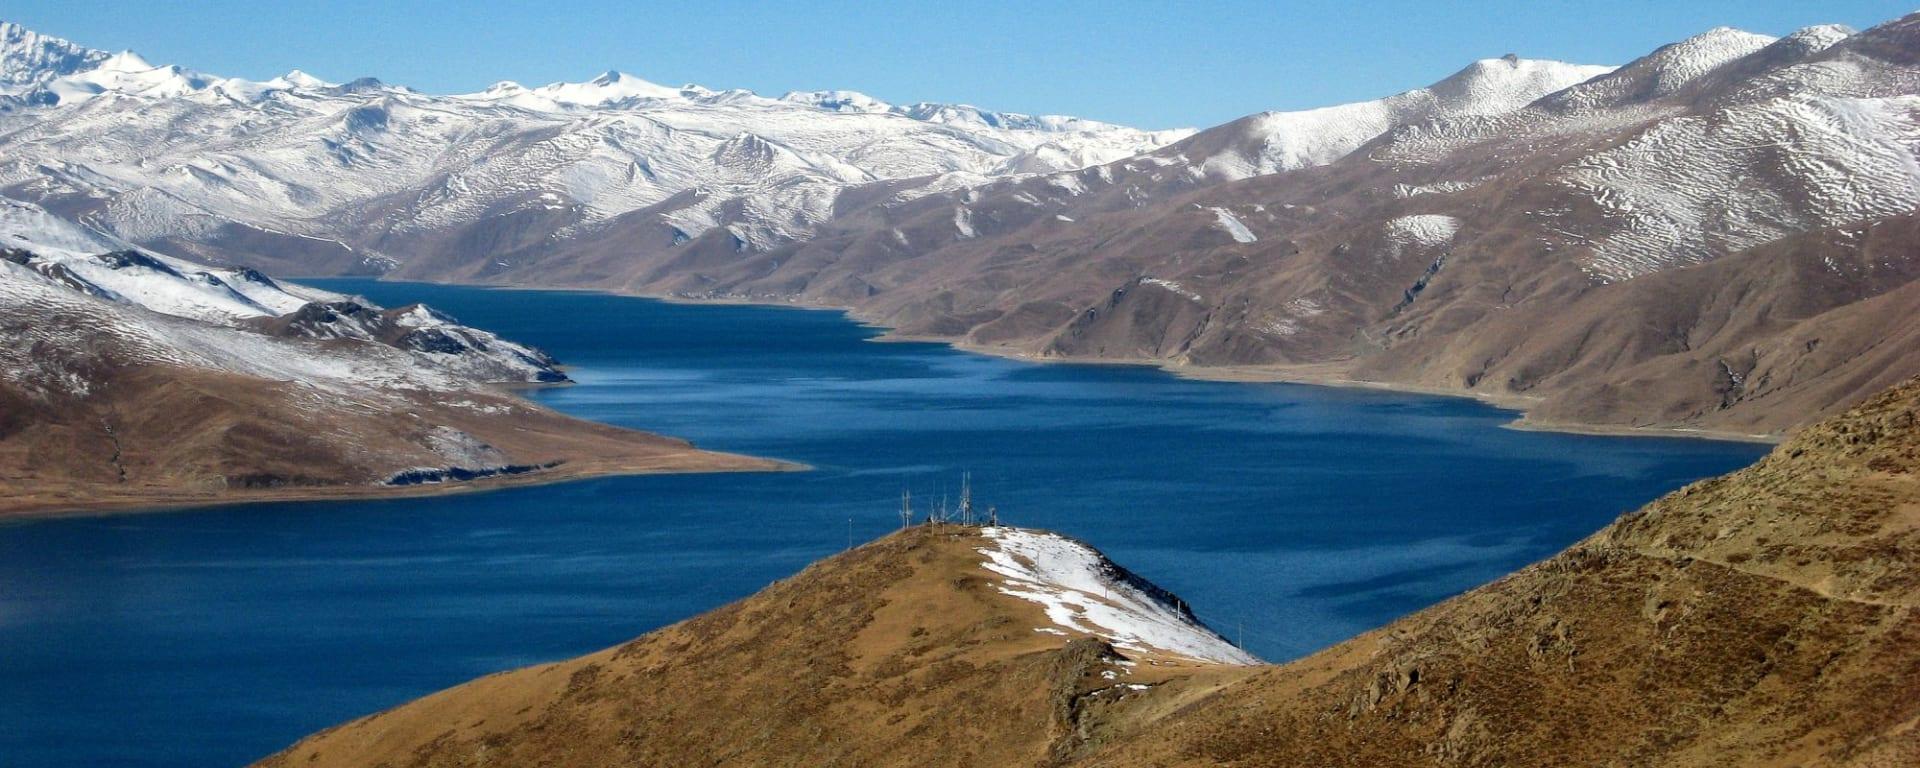 Die Magie des Tibets - Basisprogramm ab Lhasa: Yamdrok Lake